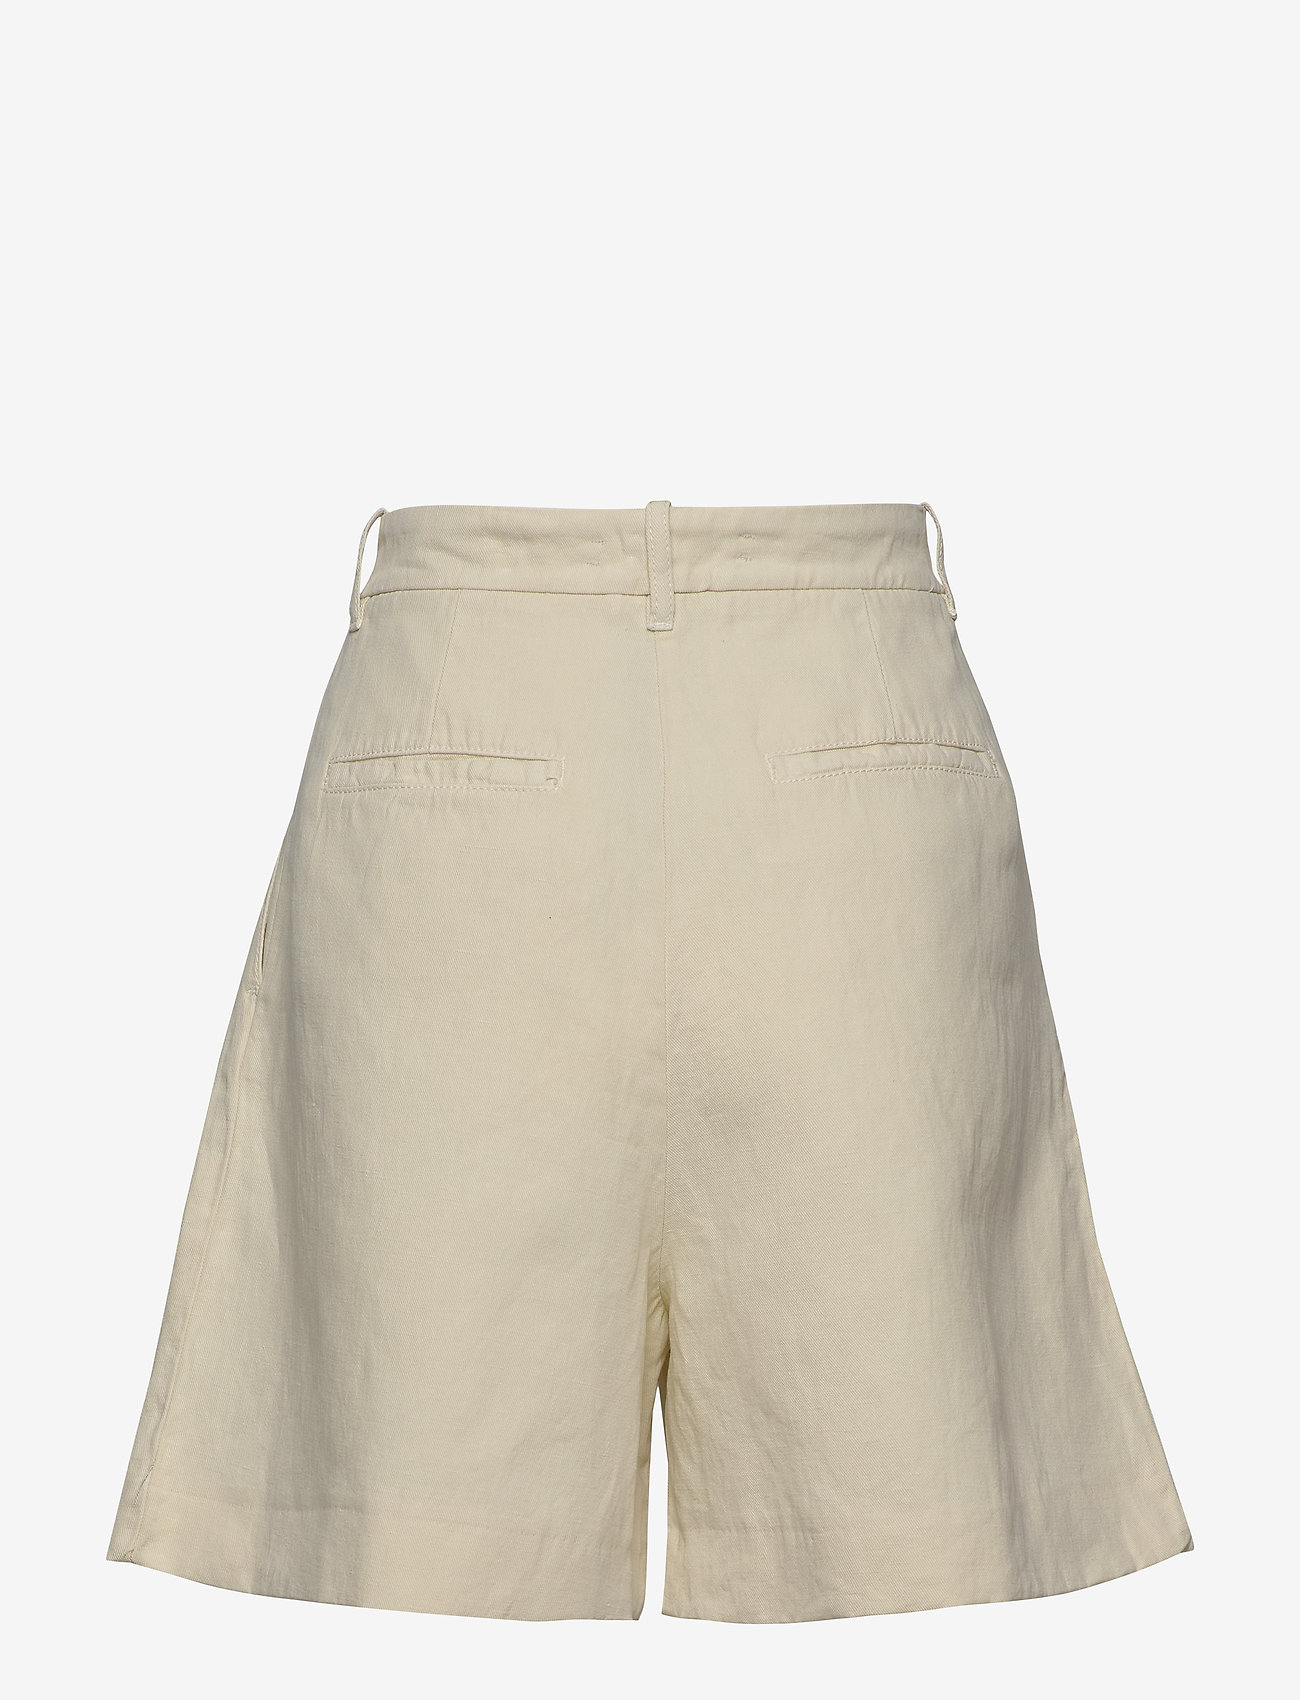 Samsøe Samsøe - Maud shorts 12659 - shorts casual - warm white - 1